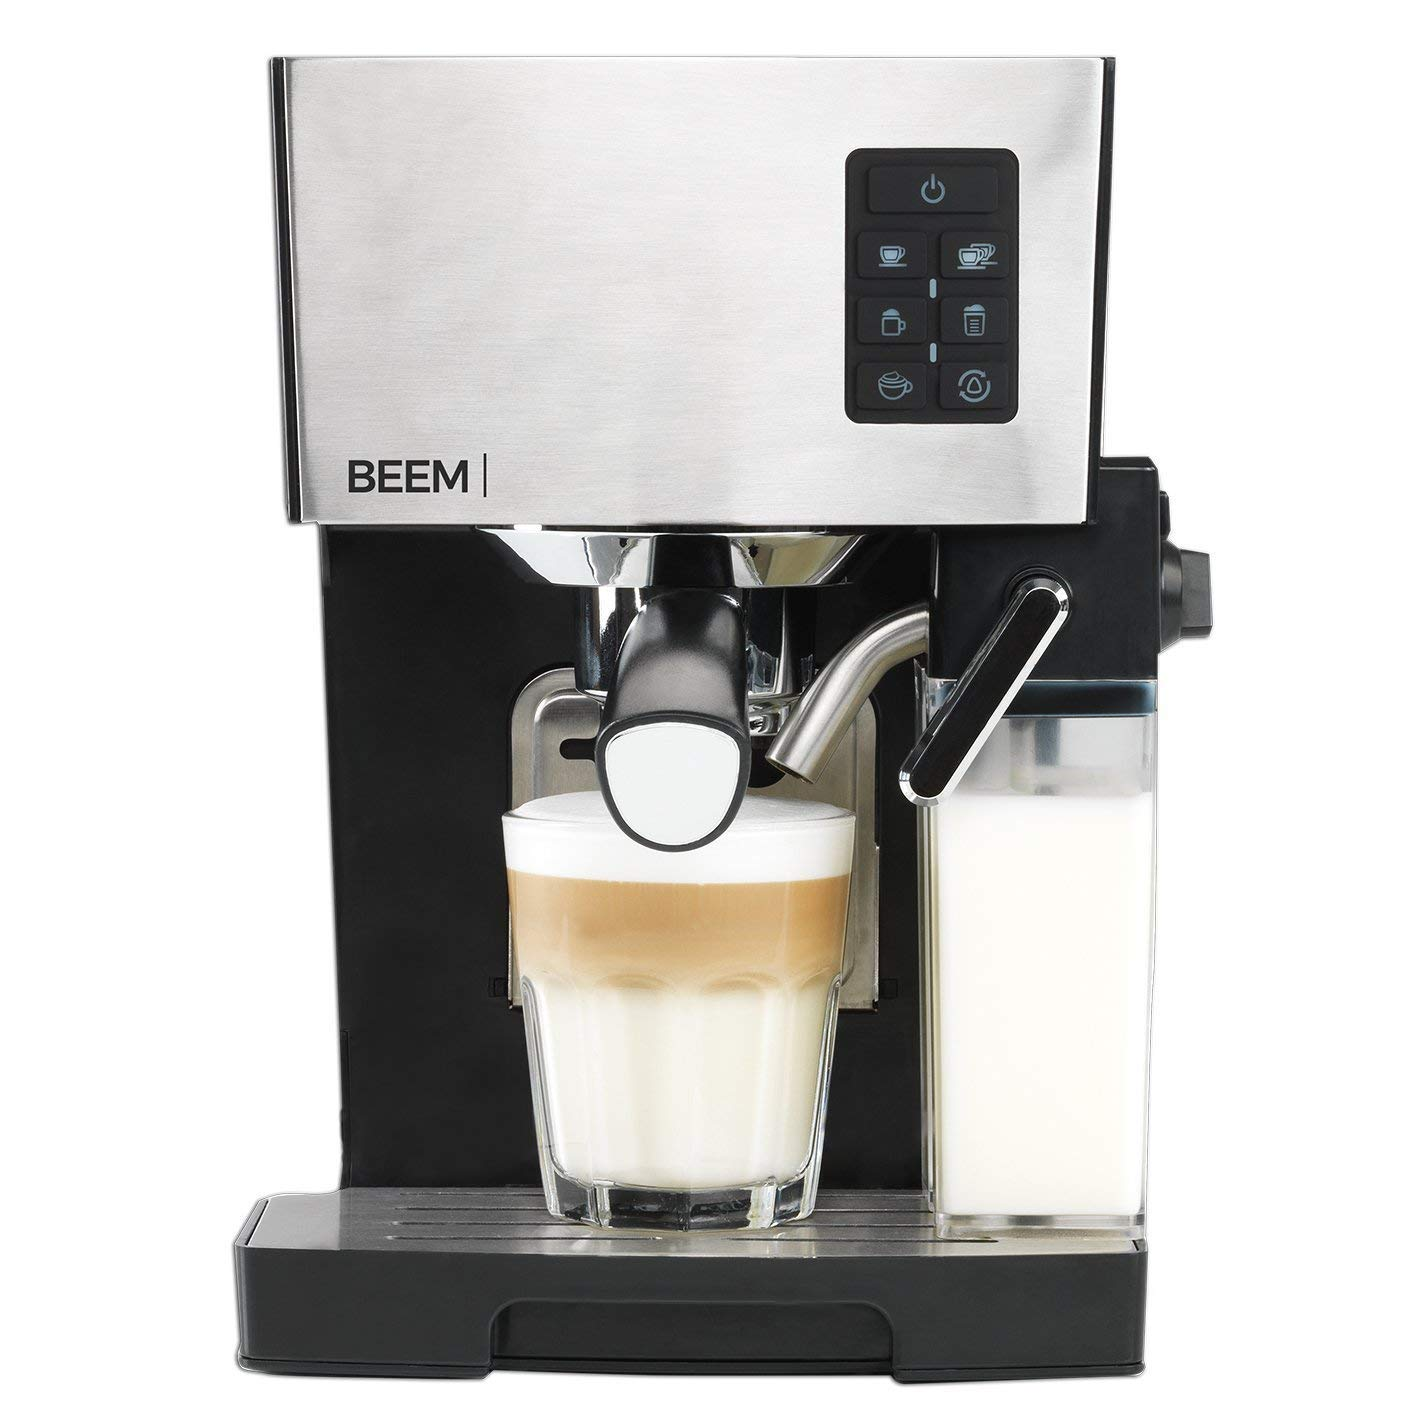 The Best Cappuccino Coffee Machine Reviews Percolatedco